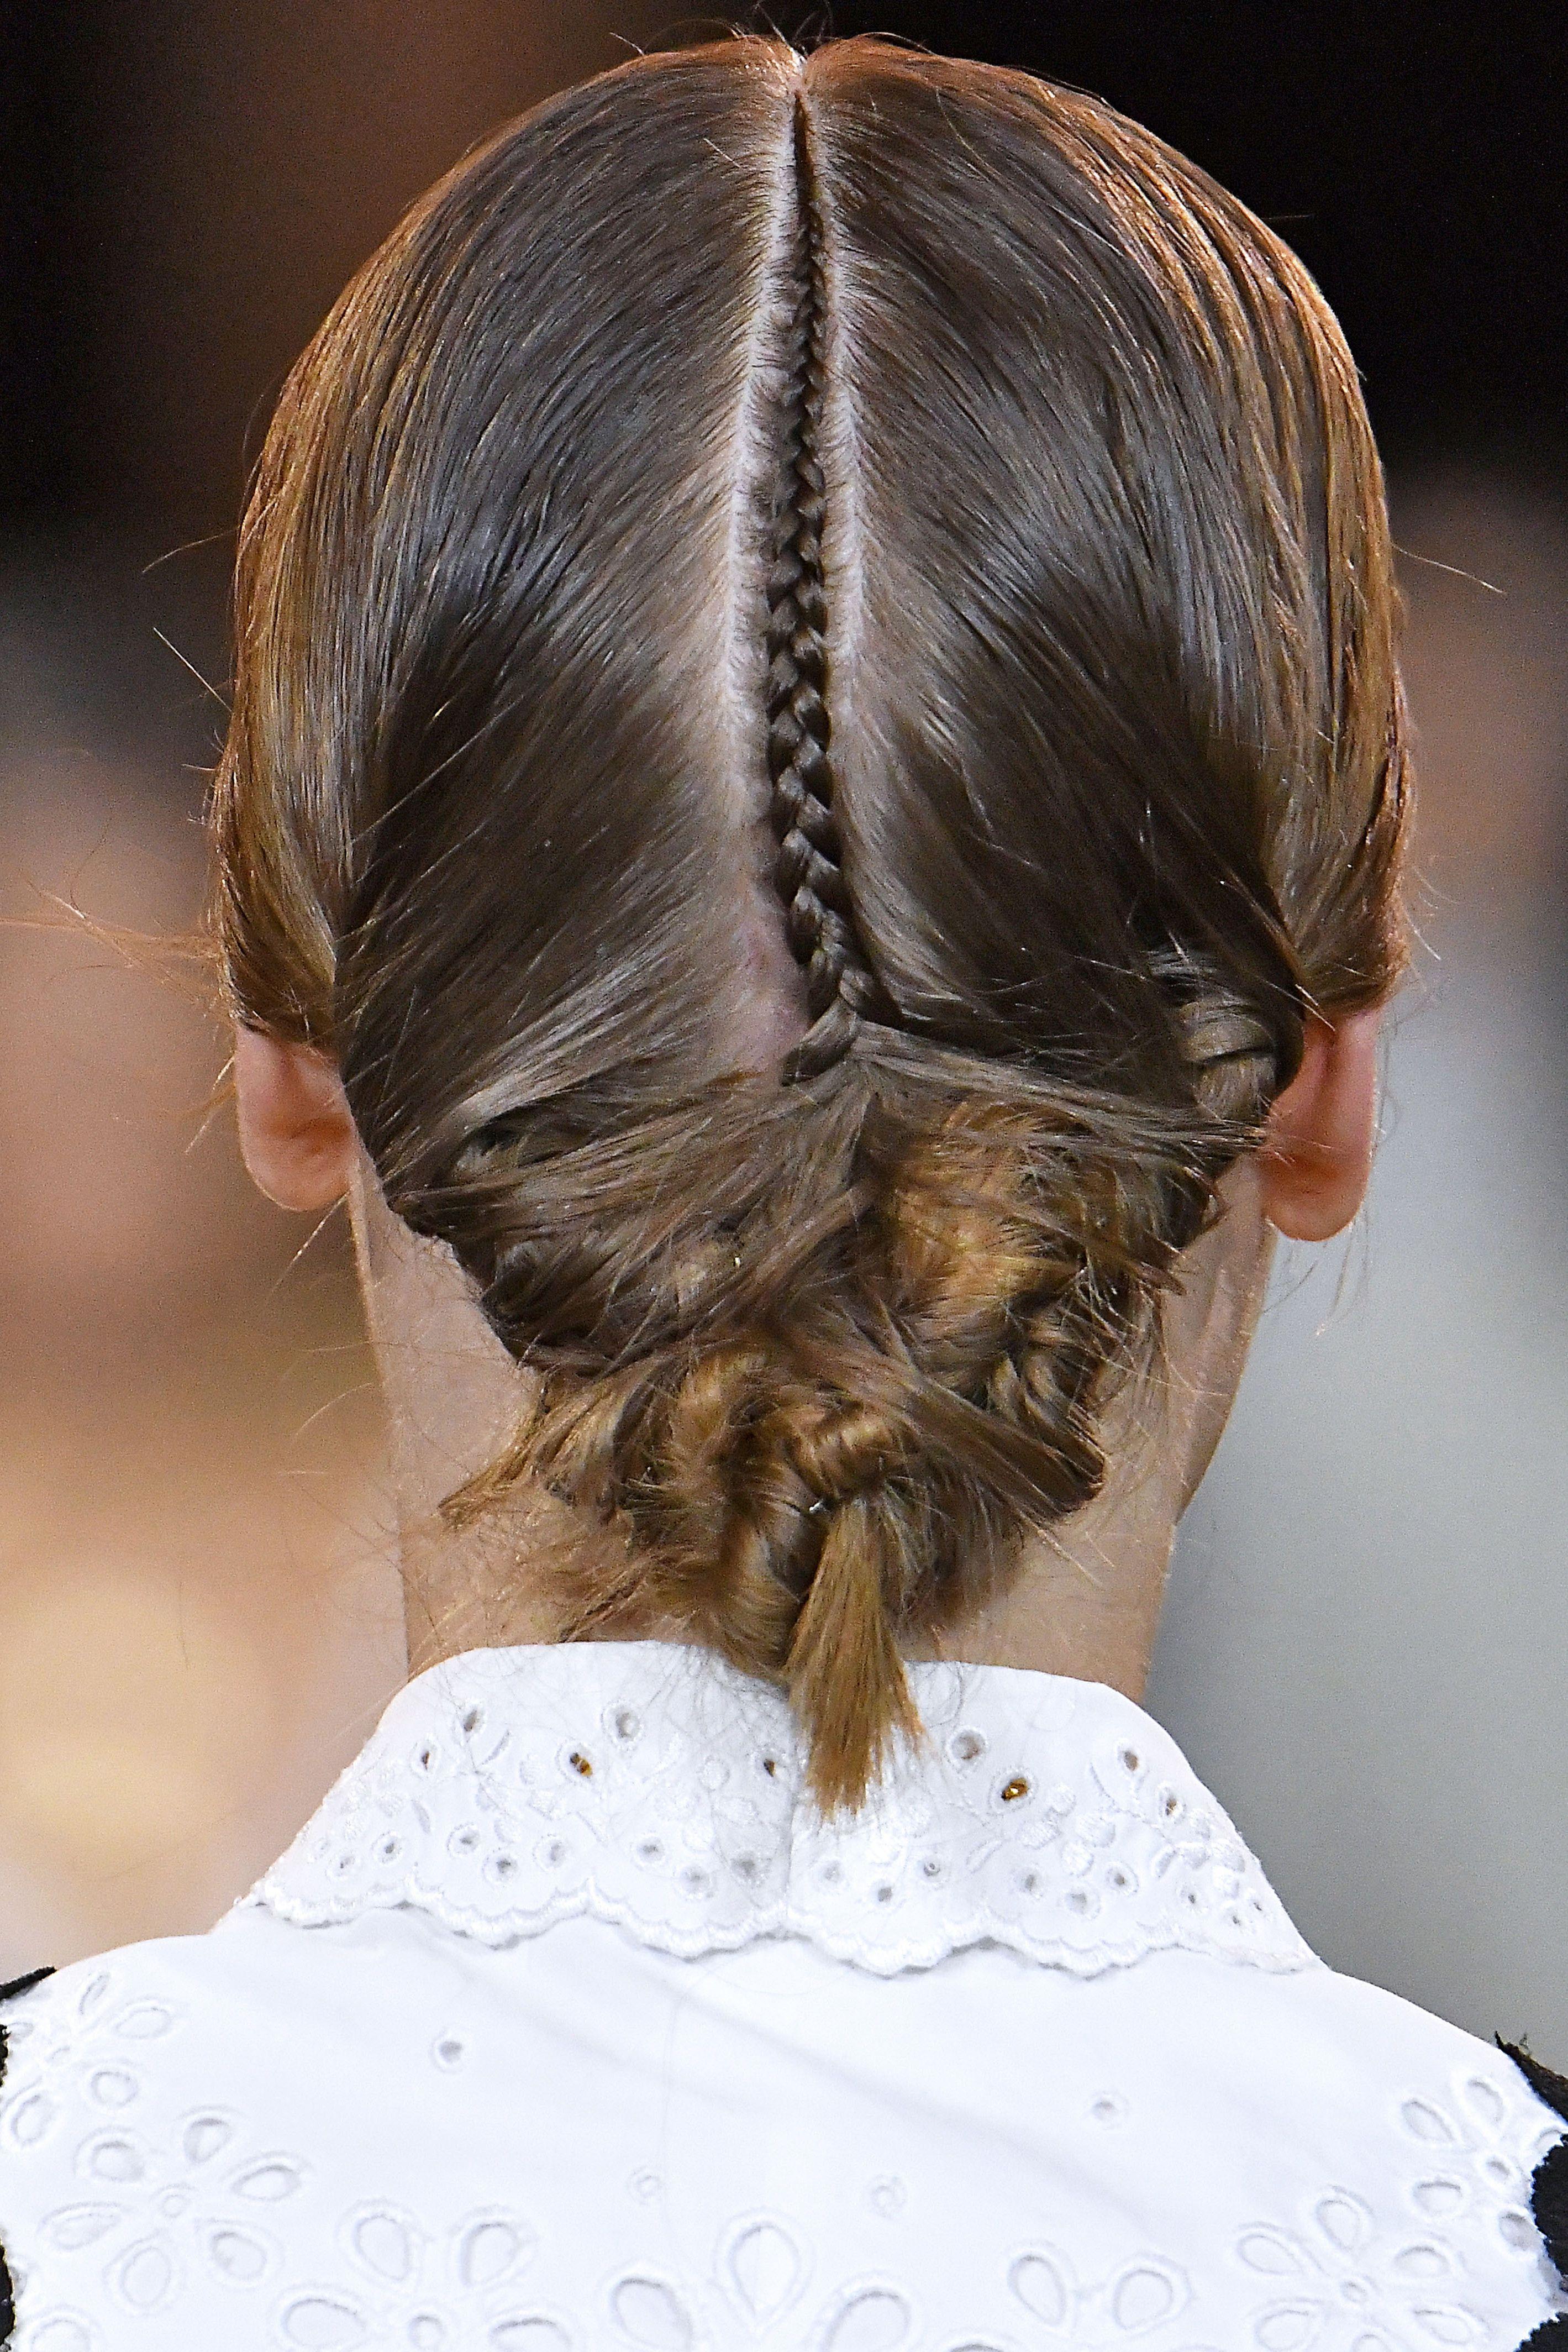 Hair Trends 2019